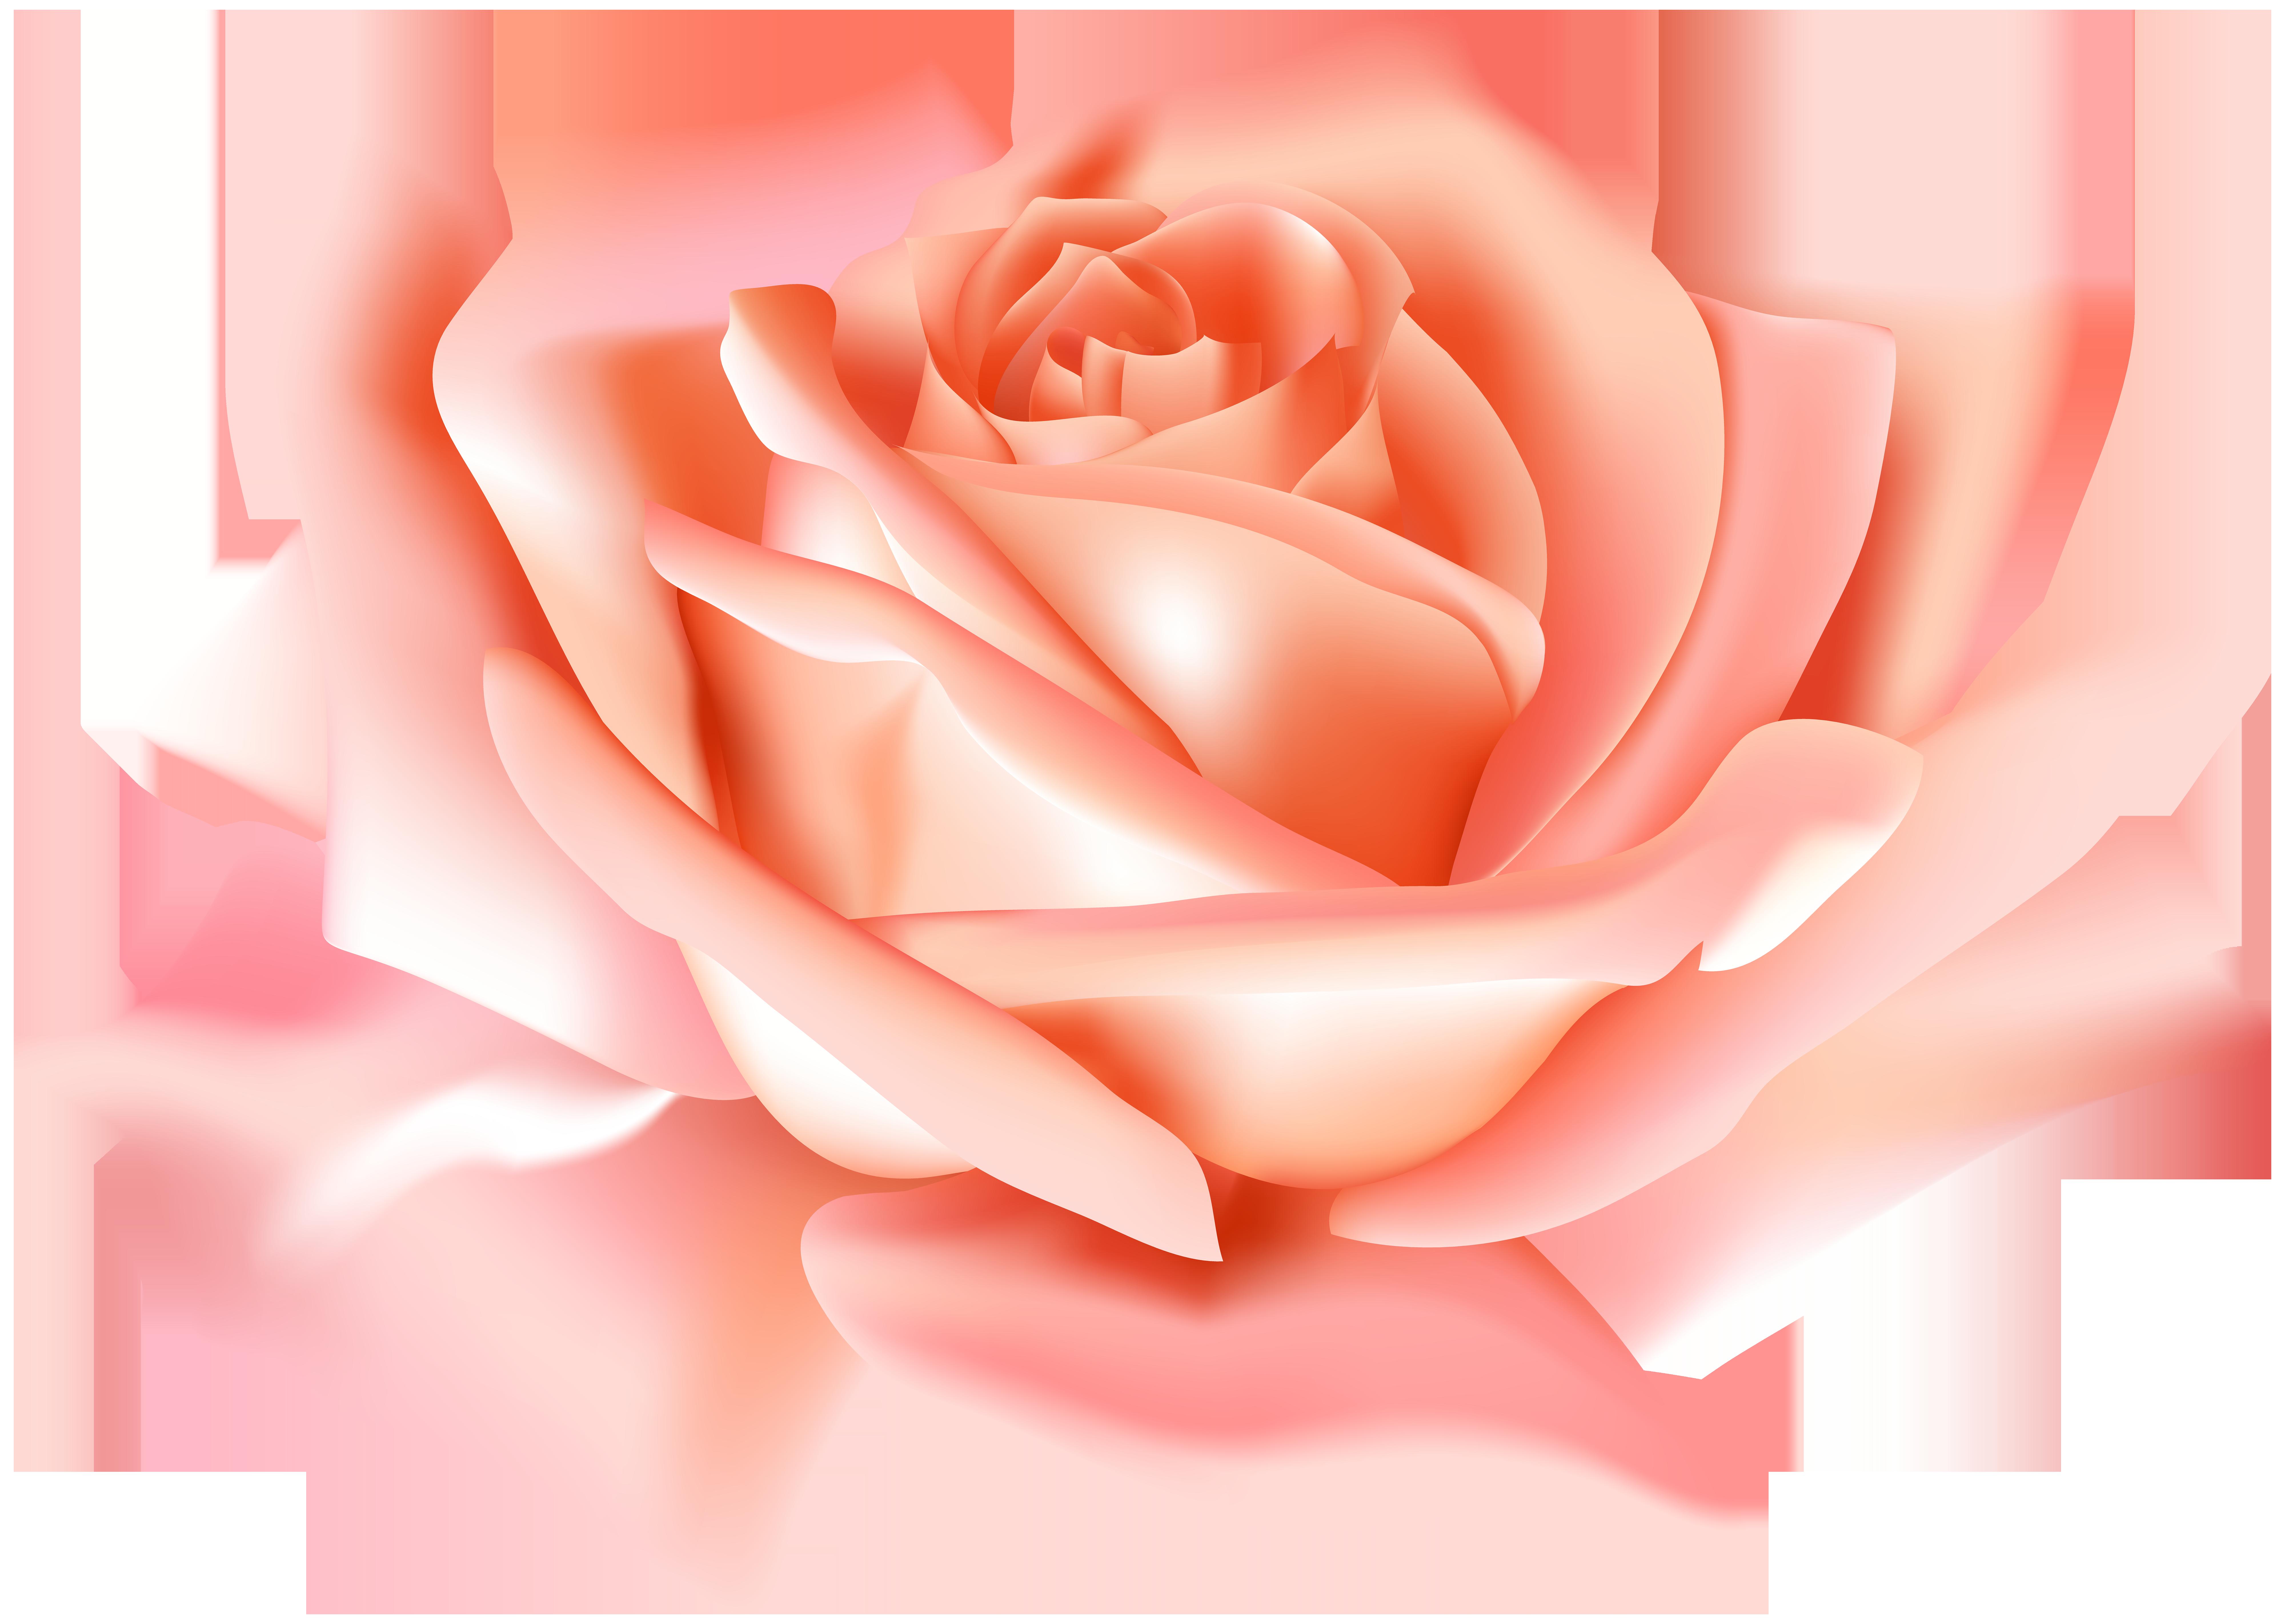 Peach Rose Flower PNG Clip Art Image.